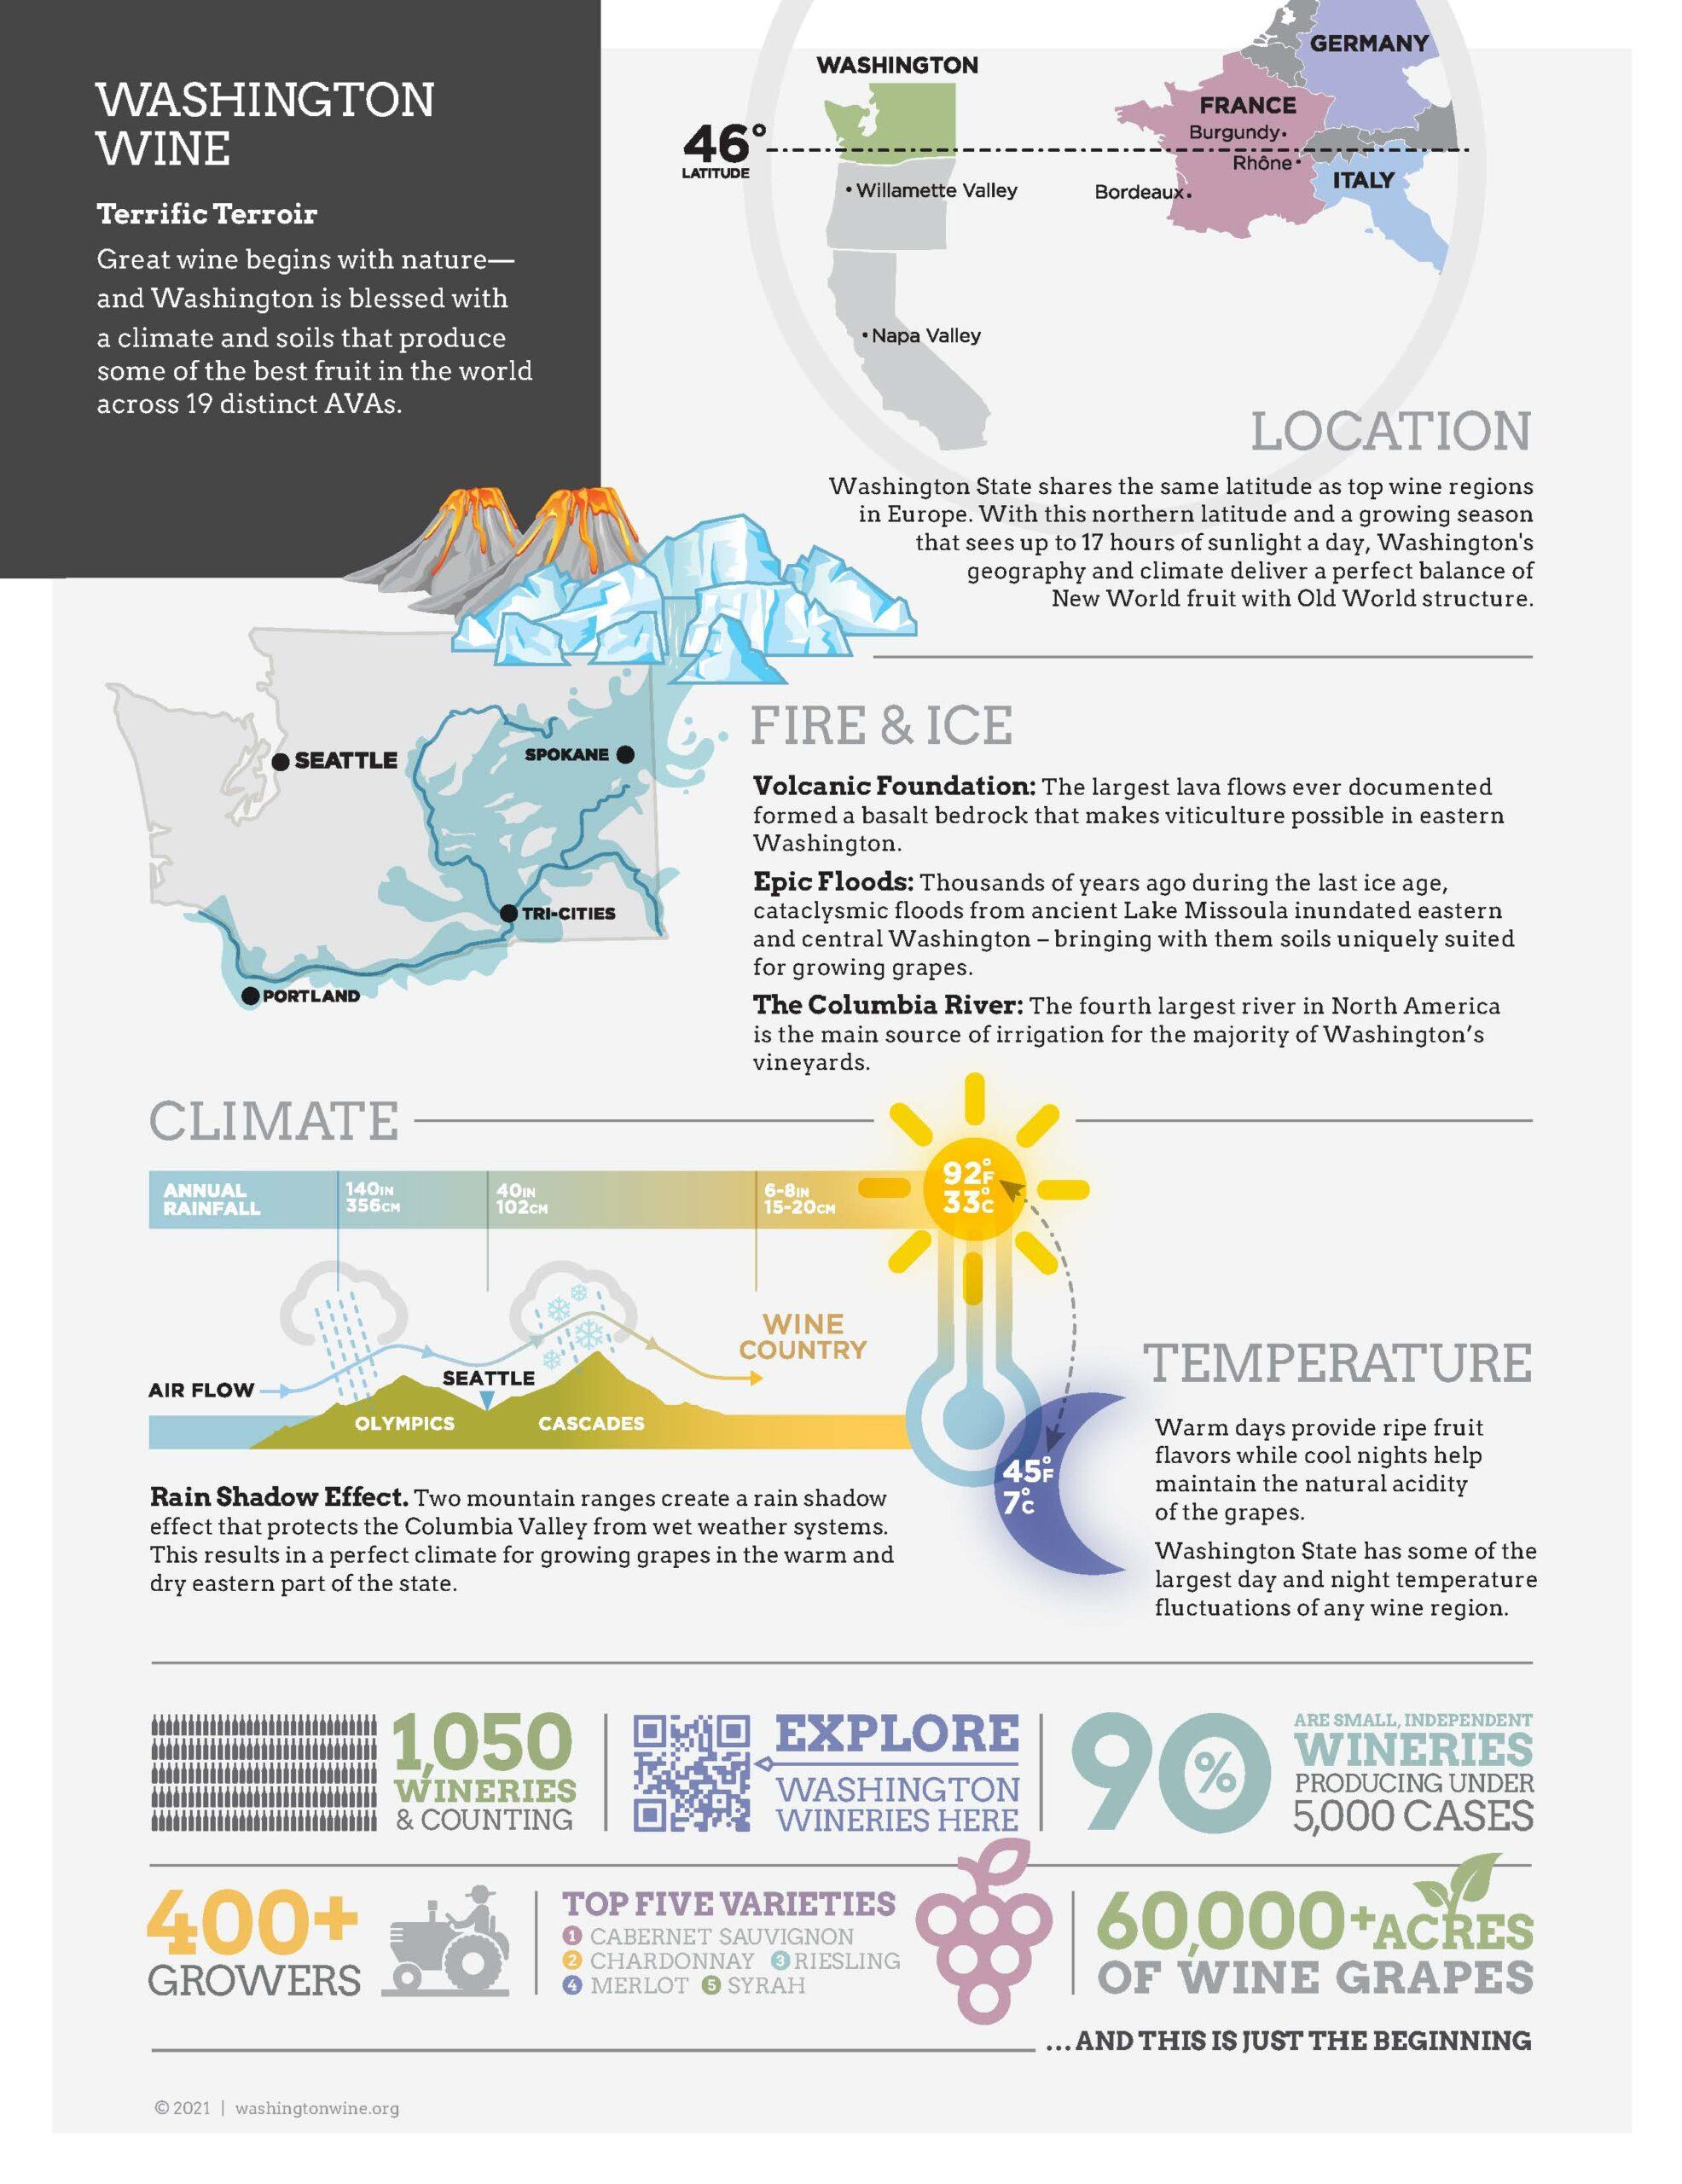 Infographic describing Washington wine's location, geologic history, climate, temperature, and statistics.